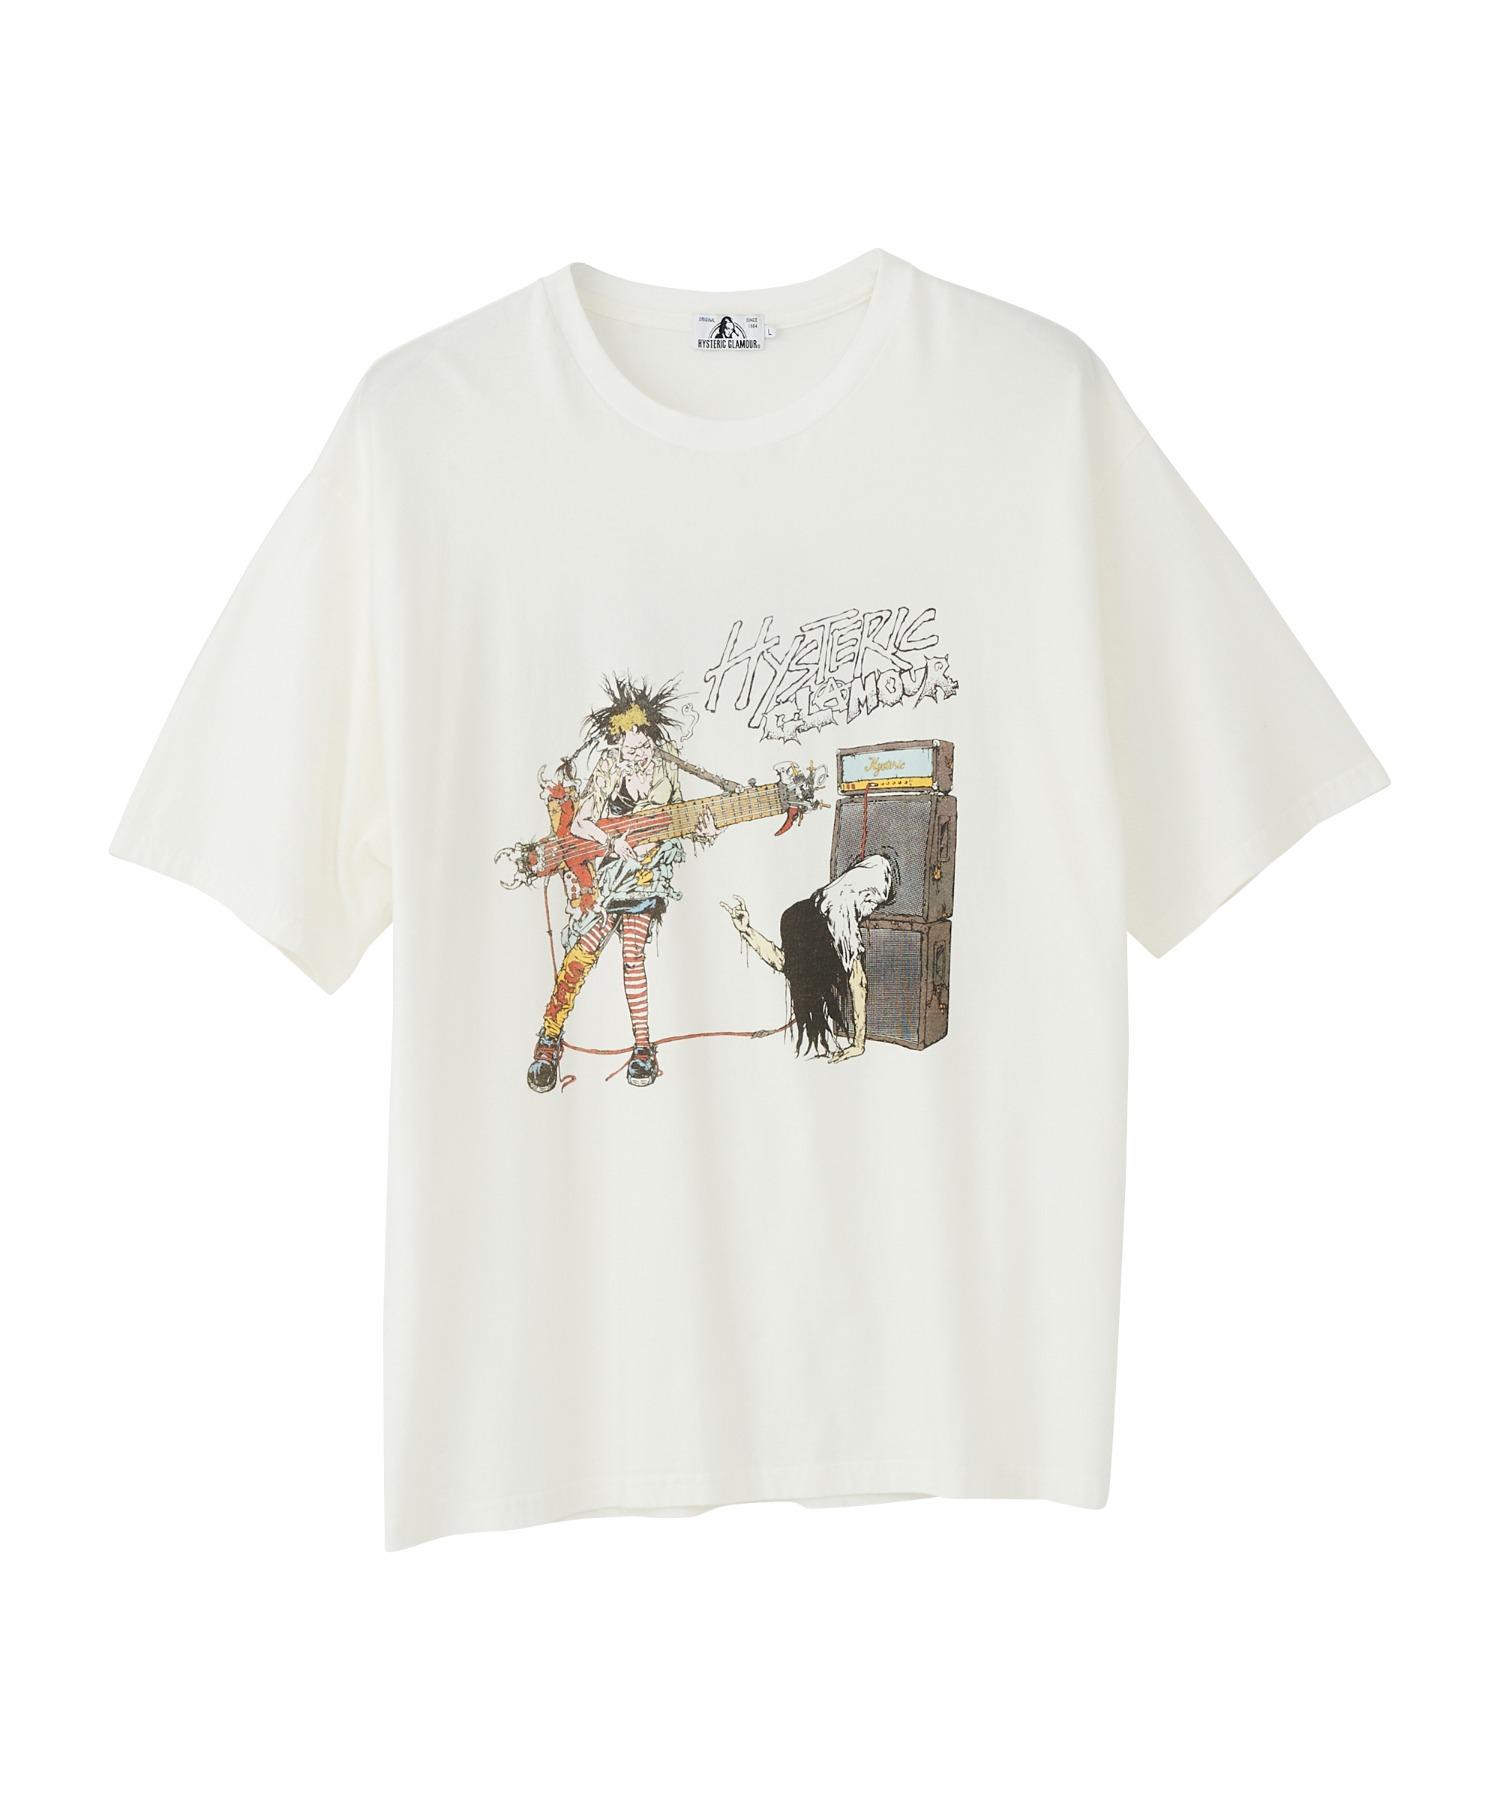 DWIKY KA×HYSTERIC GLAMOUR/Tシャツ